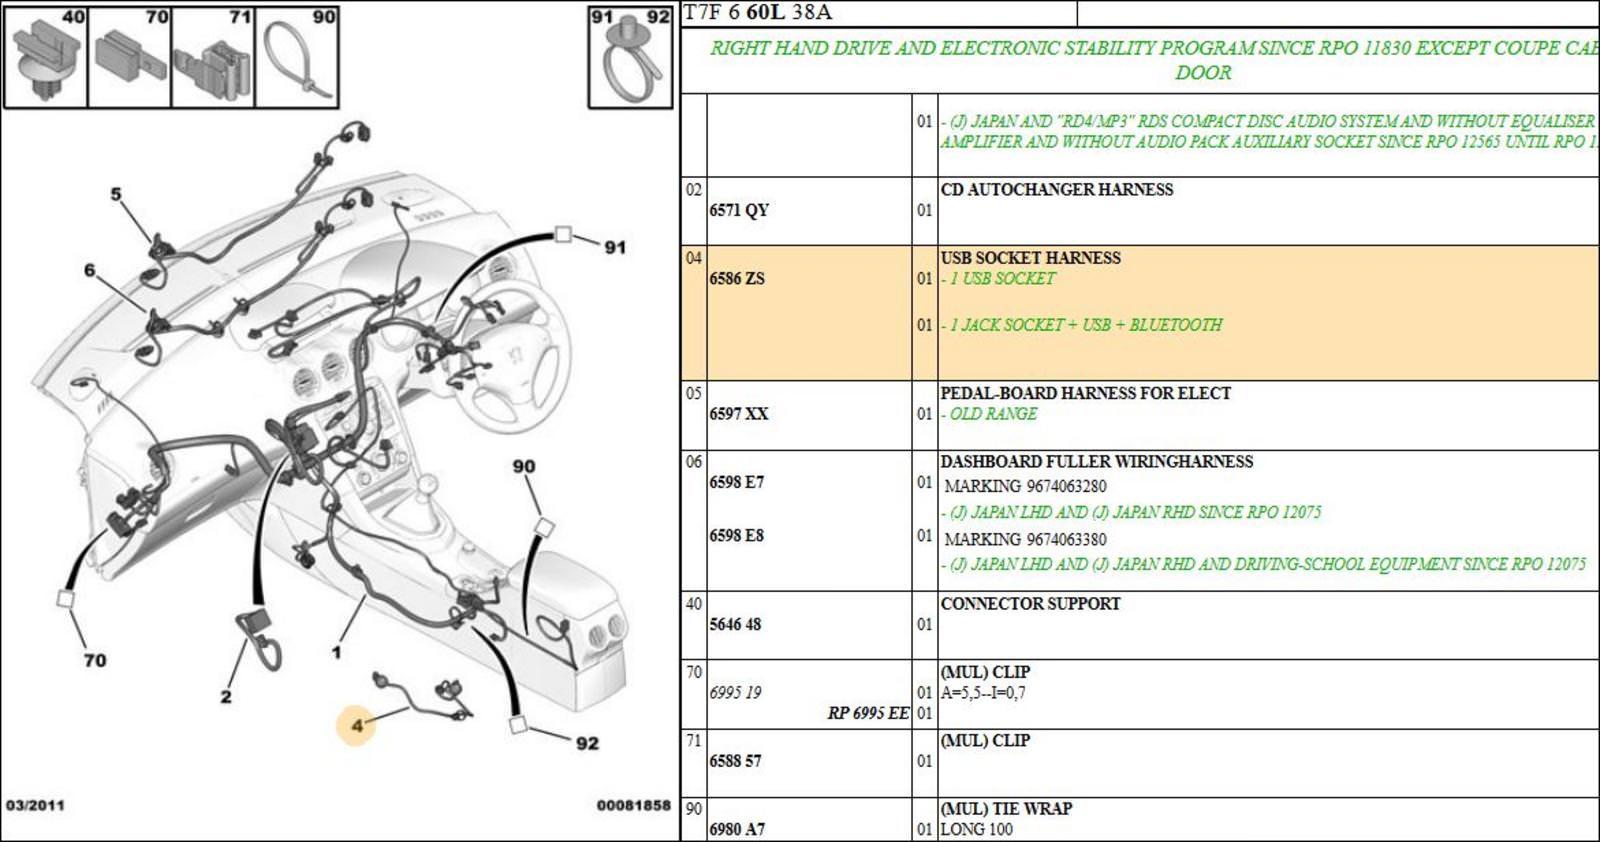 peugeot 308 - usb socket harness